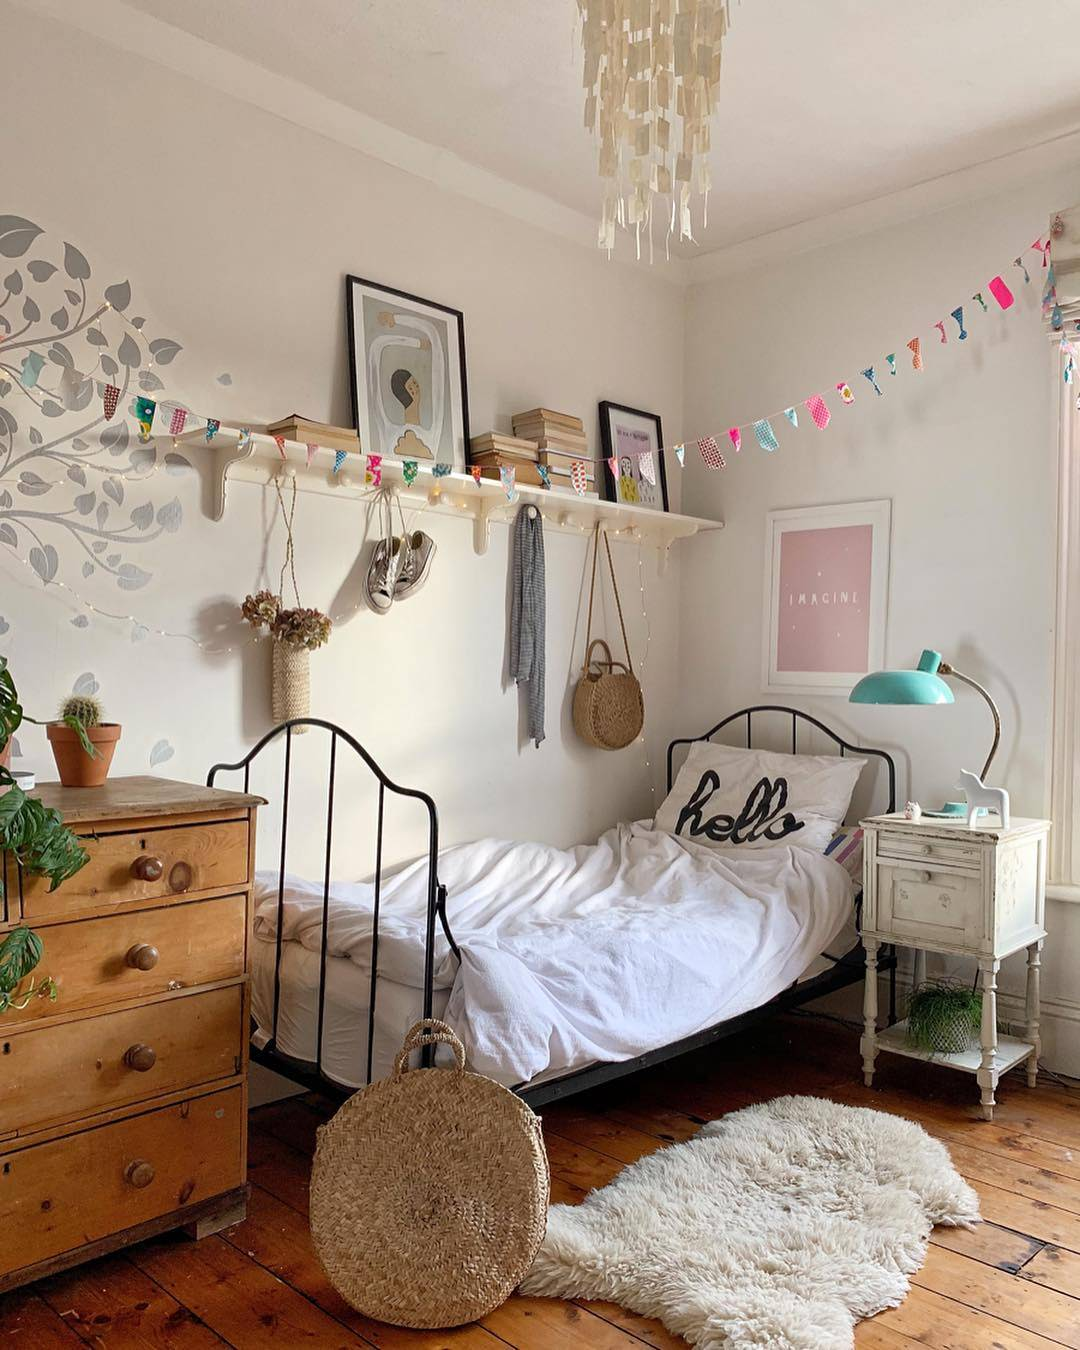 . 75 Wall Decor Ideas for an Insta worthy Home   arthaus